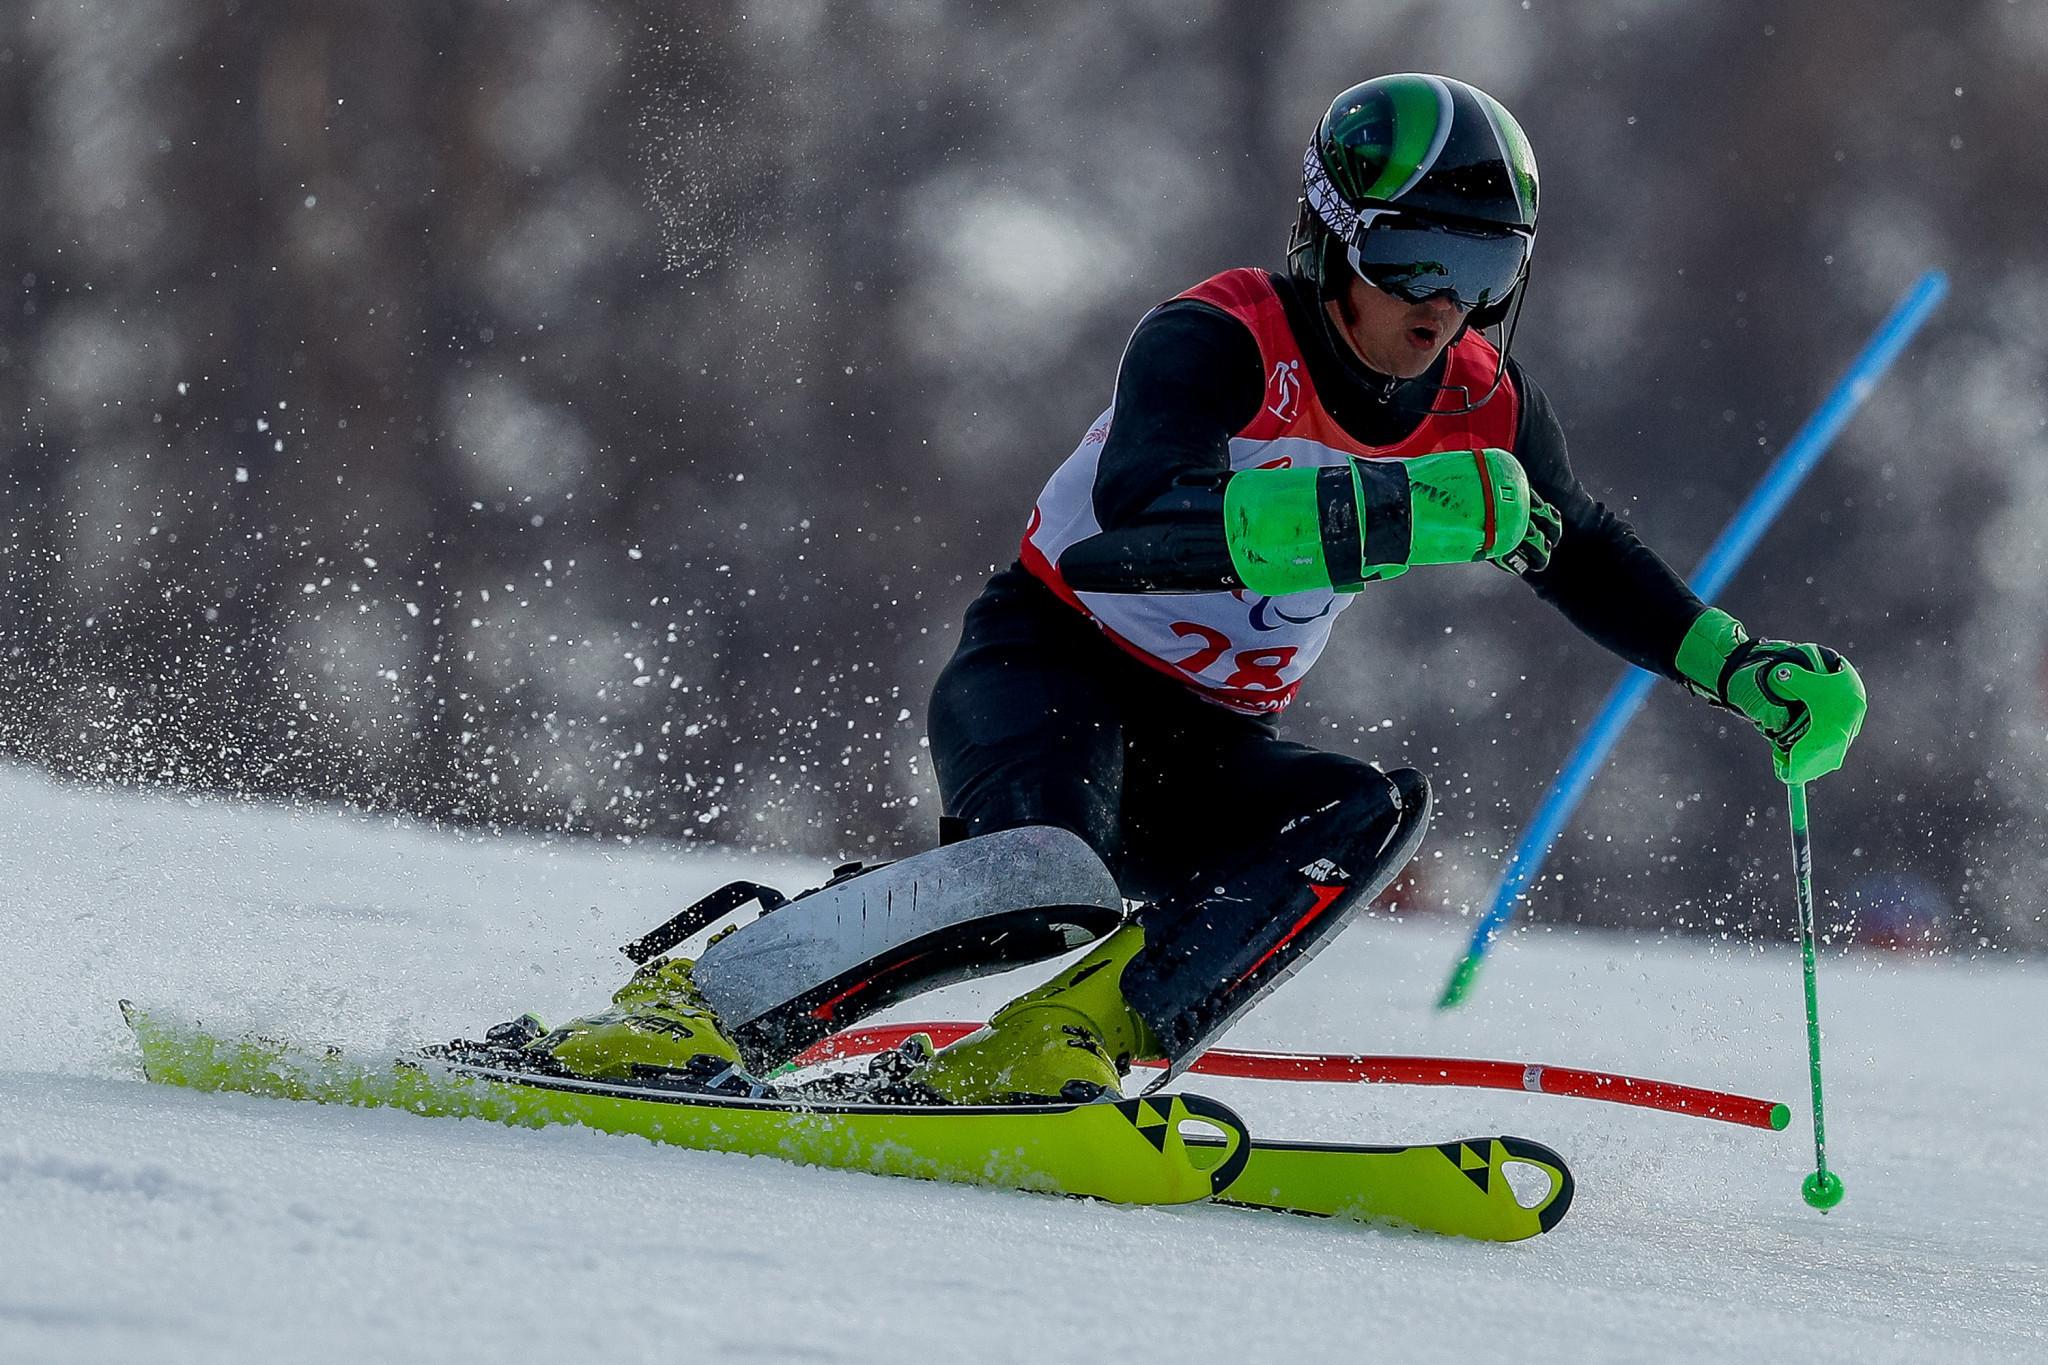 Bugaev maintains winning momentum at World Para Alpine Skiing World Cup